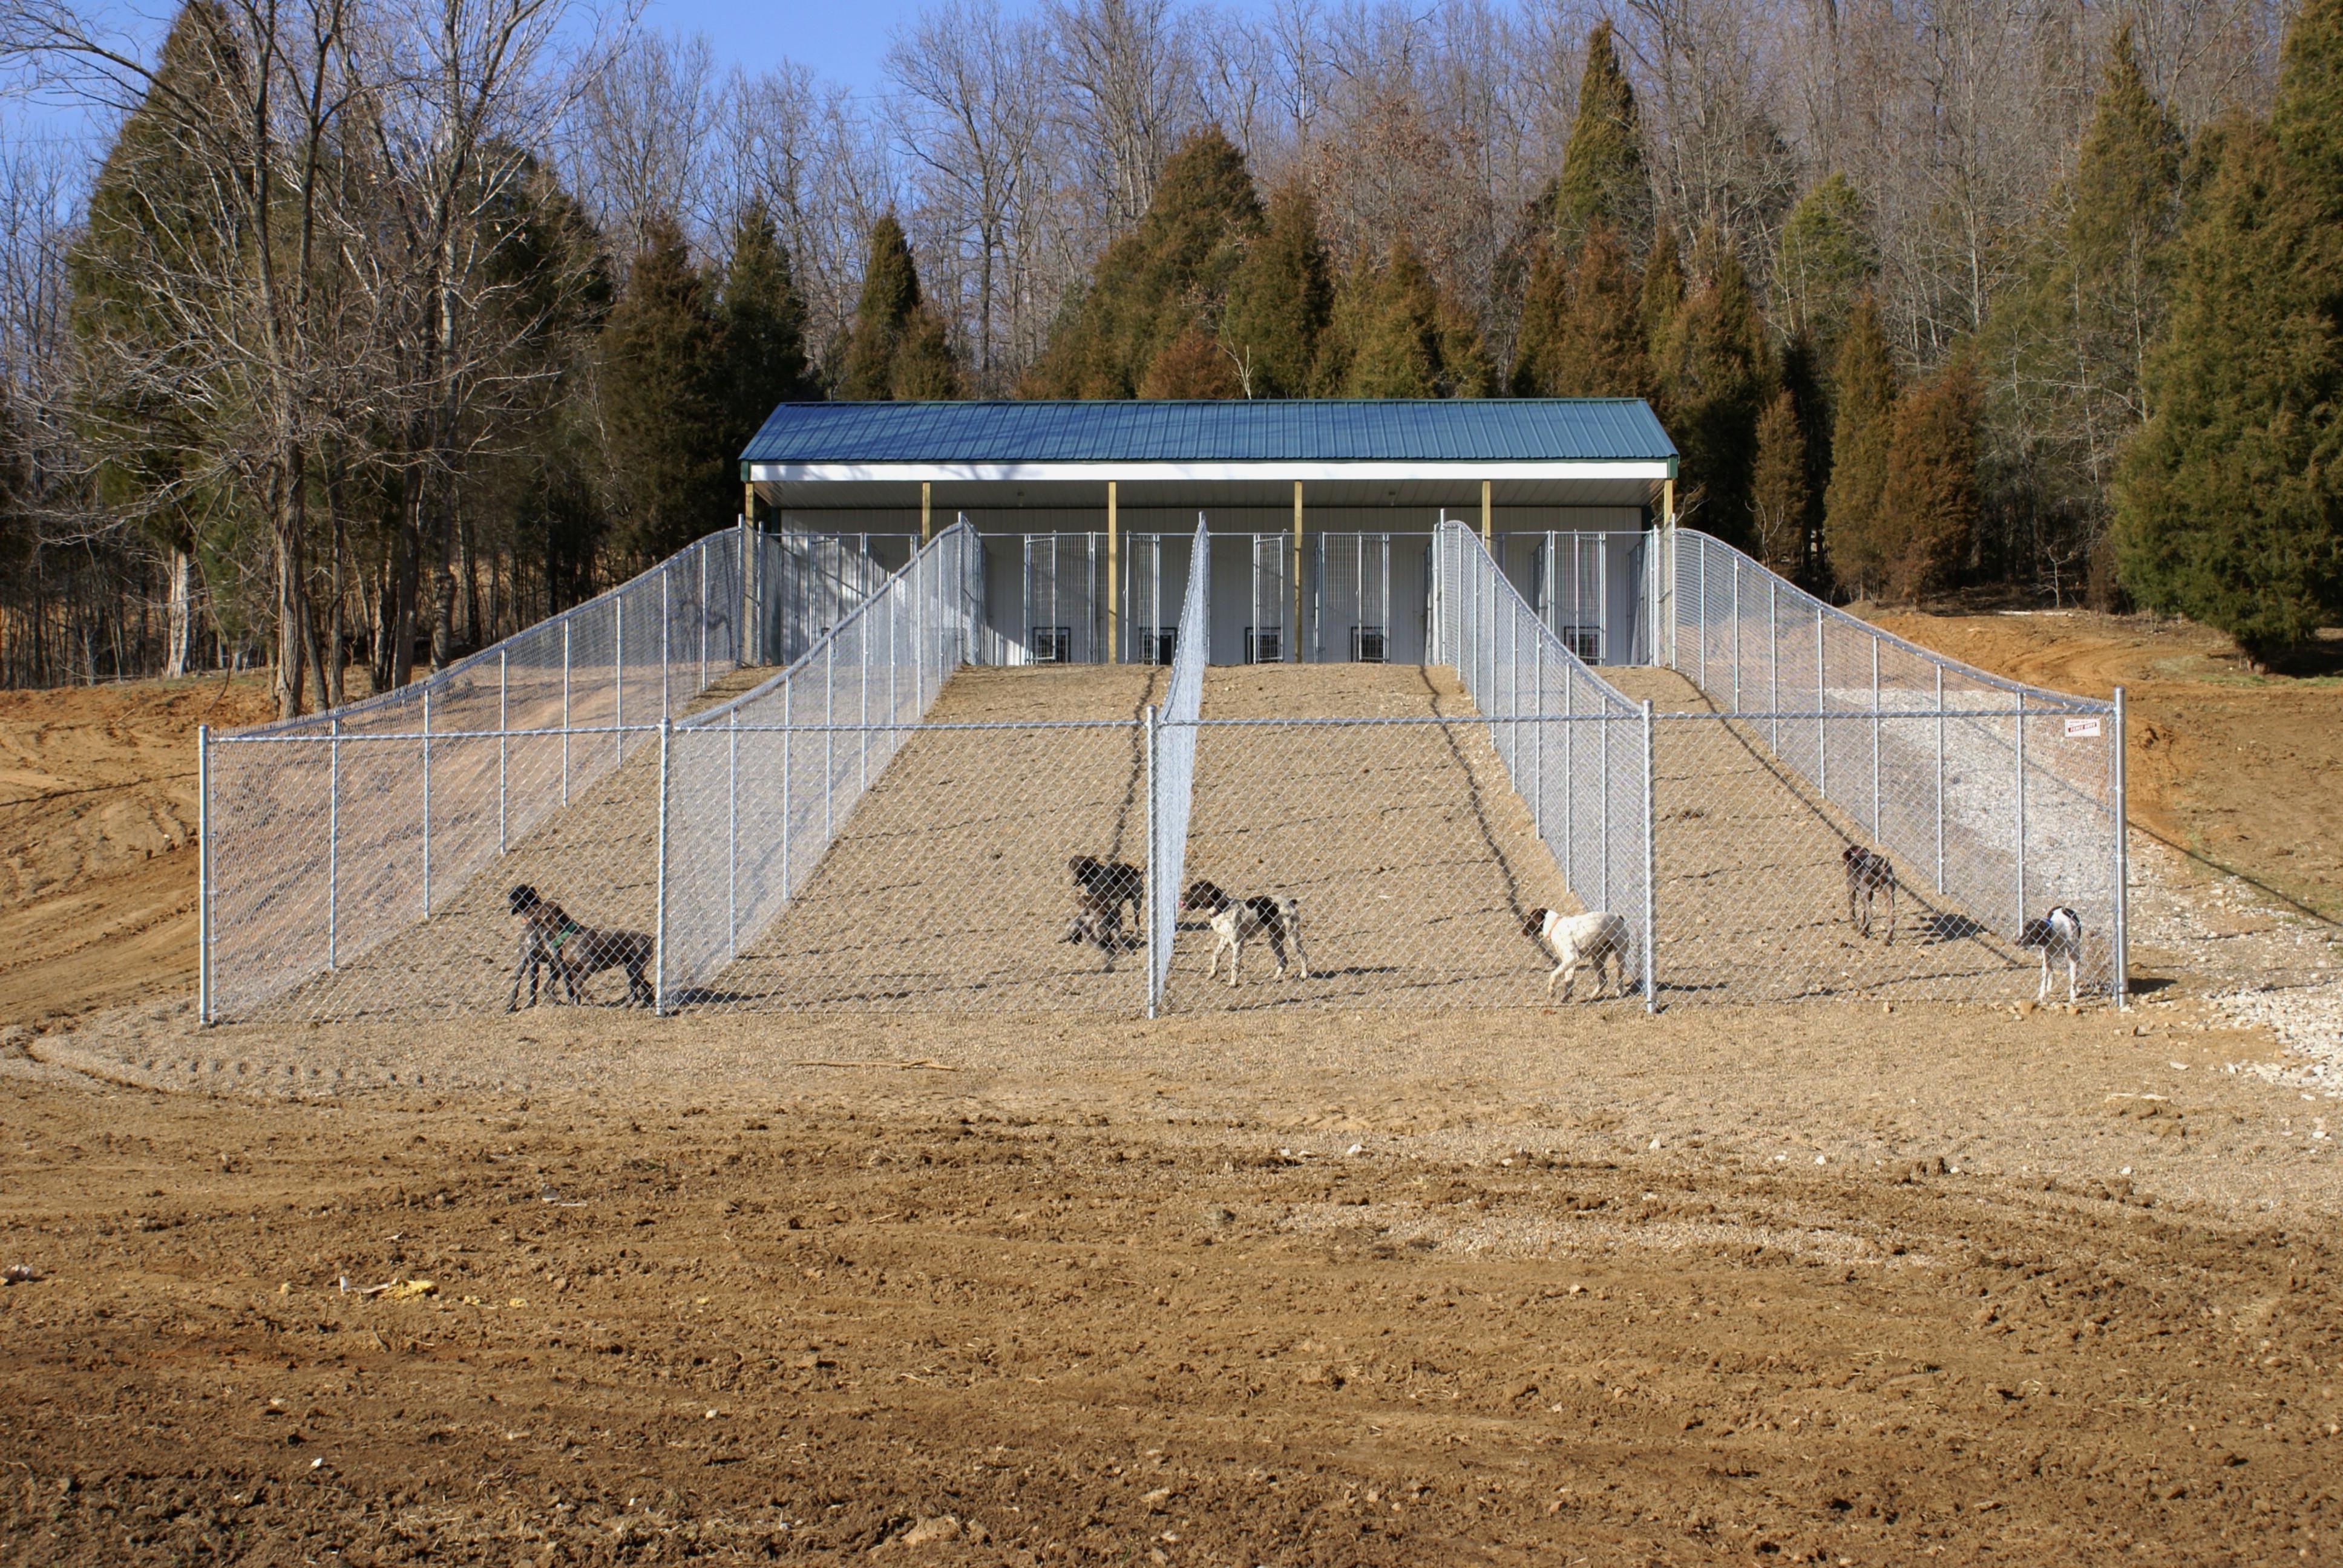 20.backyard dog kennel wonderful decoration ideas SIMPHOME.COM